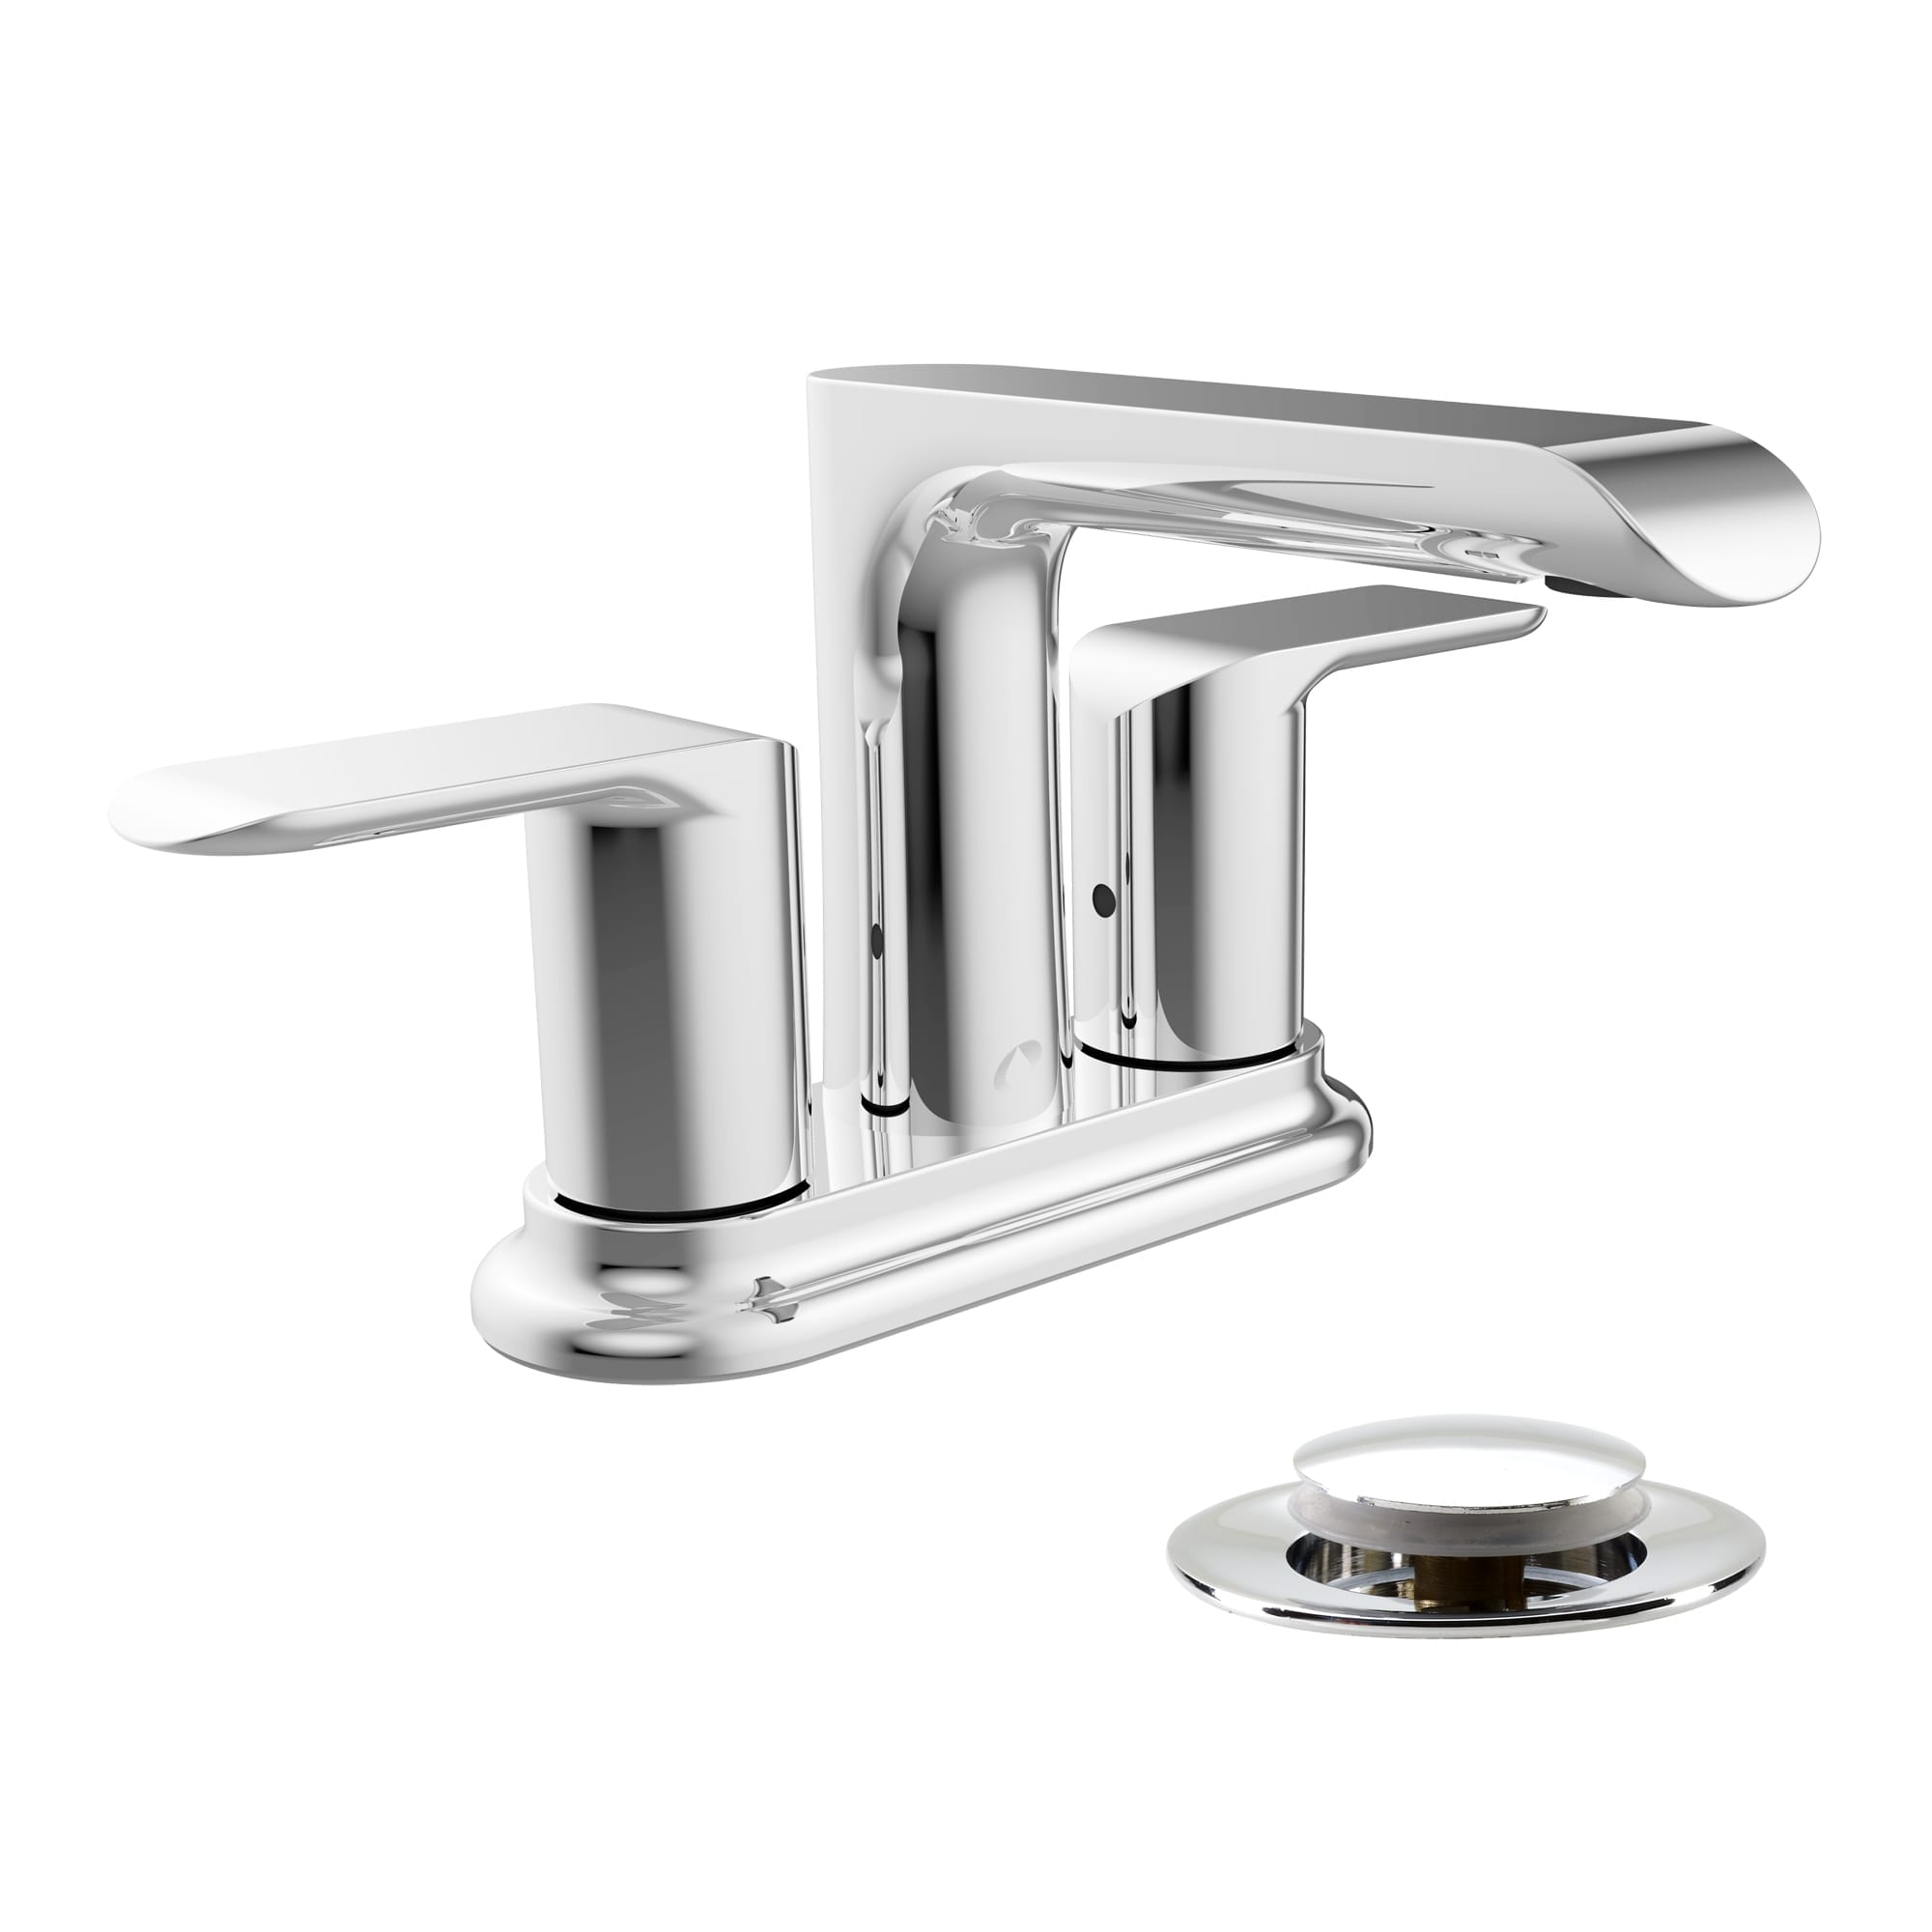 https belangerh2o com en shop swivel aerator lavatory sink faucet swivel aerator